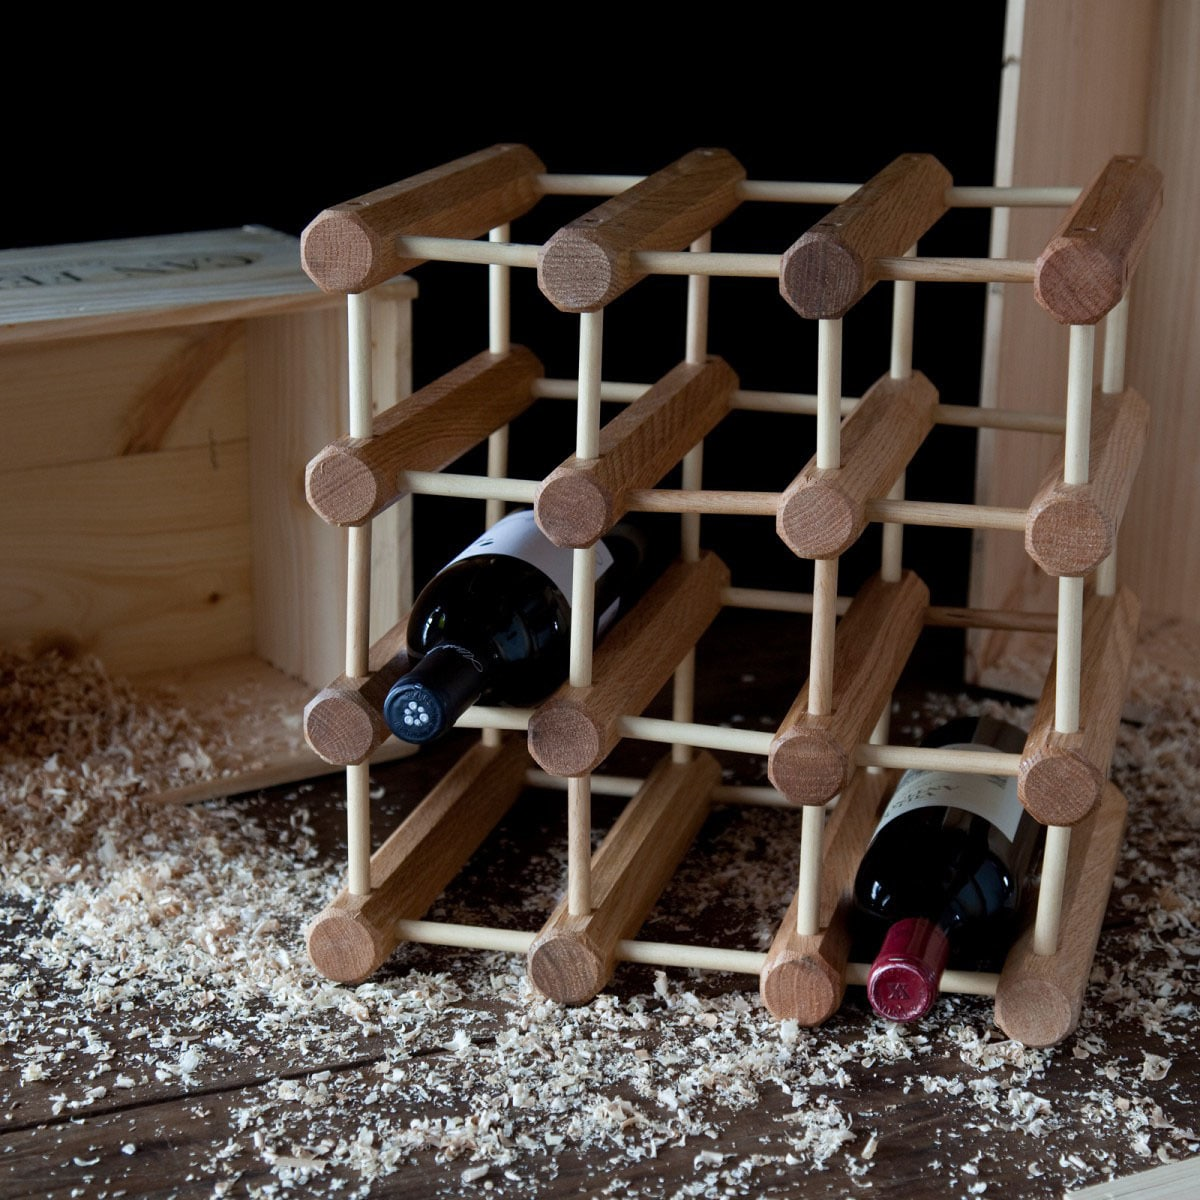 wood ebay solid stackable itm homcom racks rack bottle holder wine cube storage